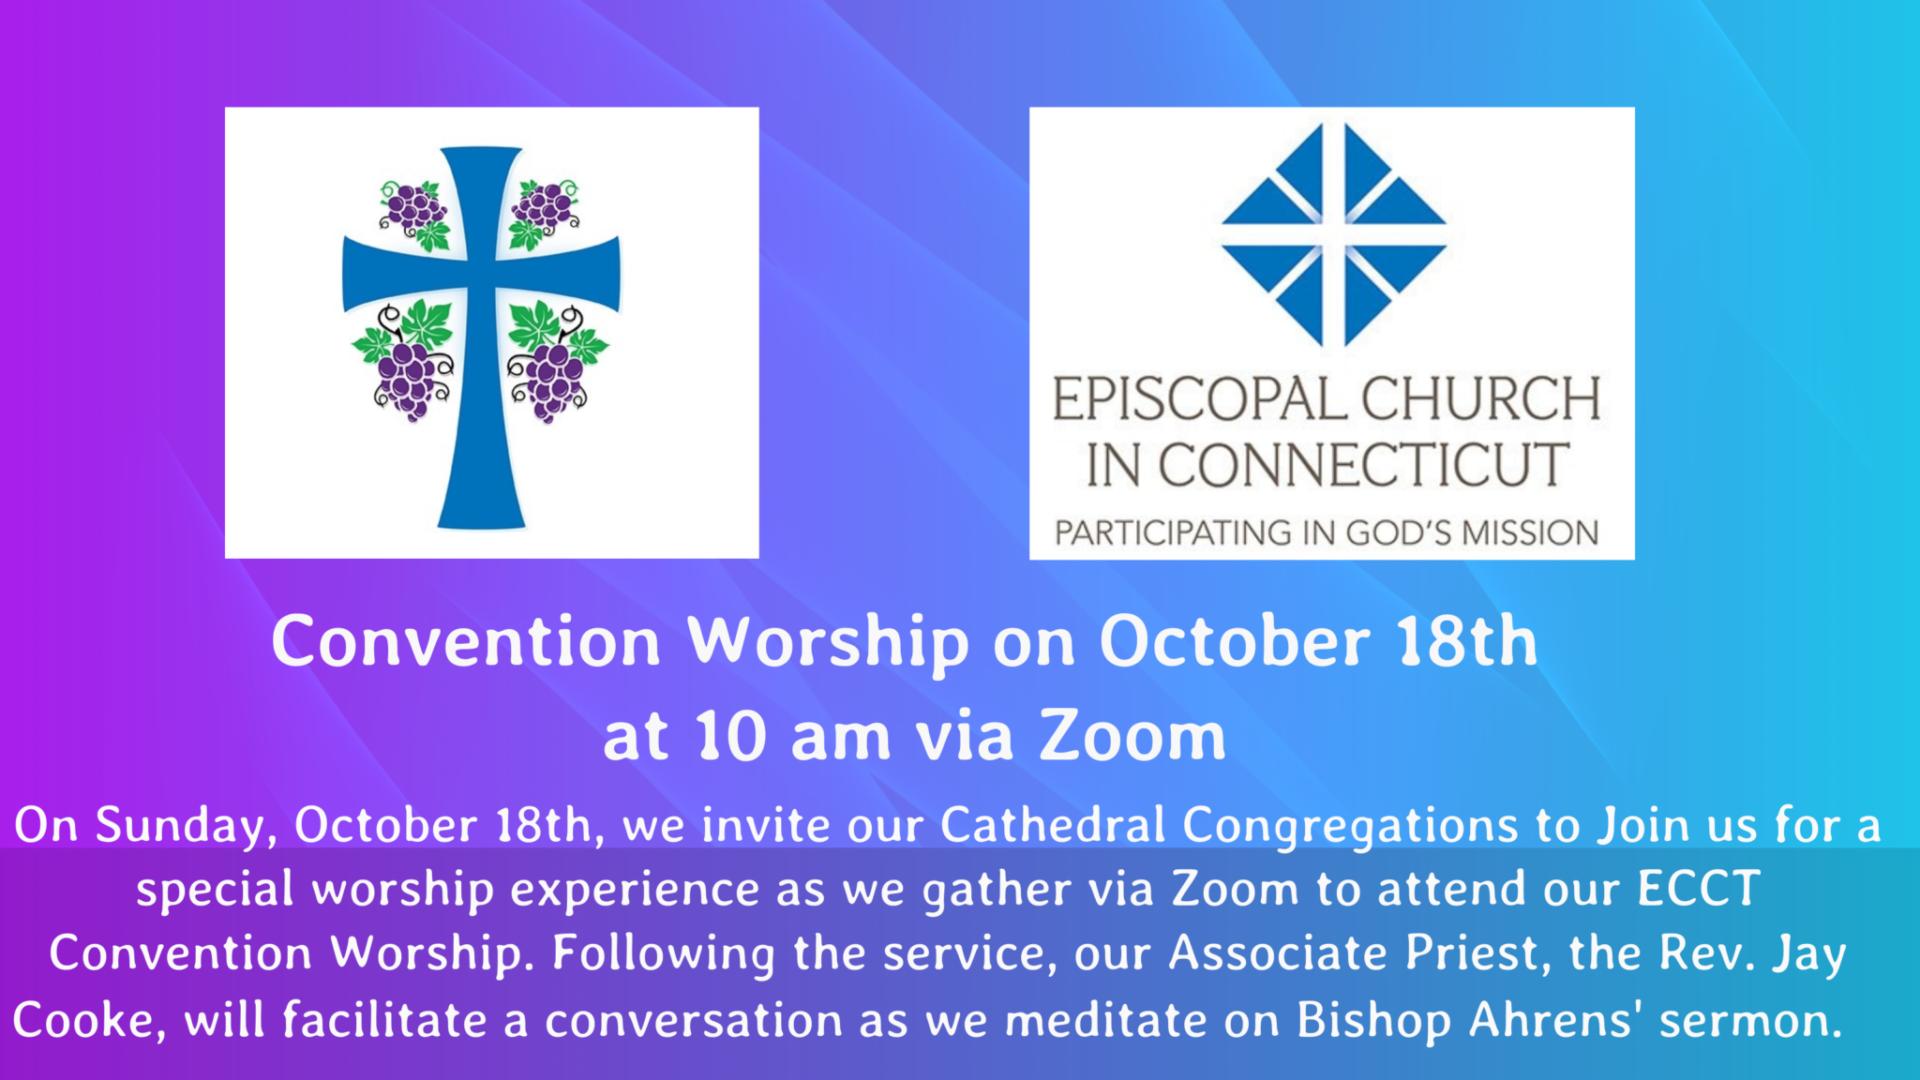 ECCT Convention Worship